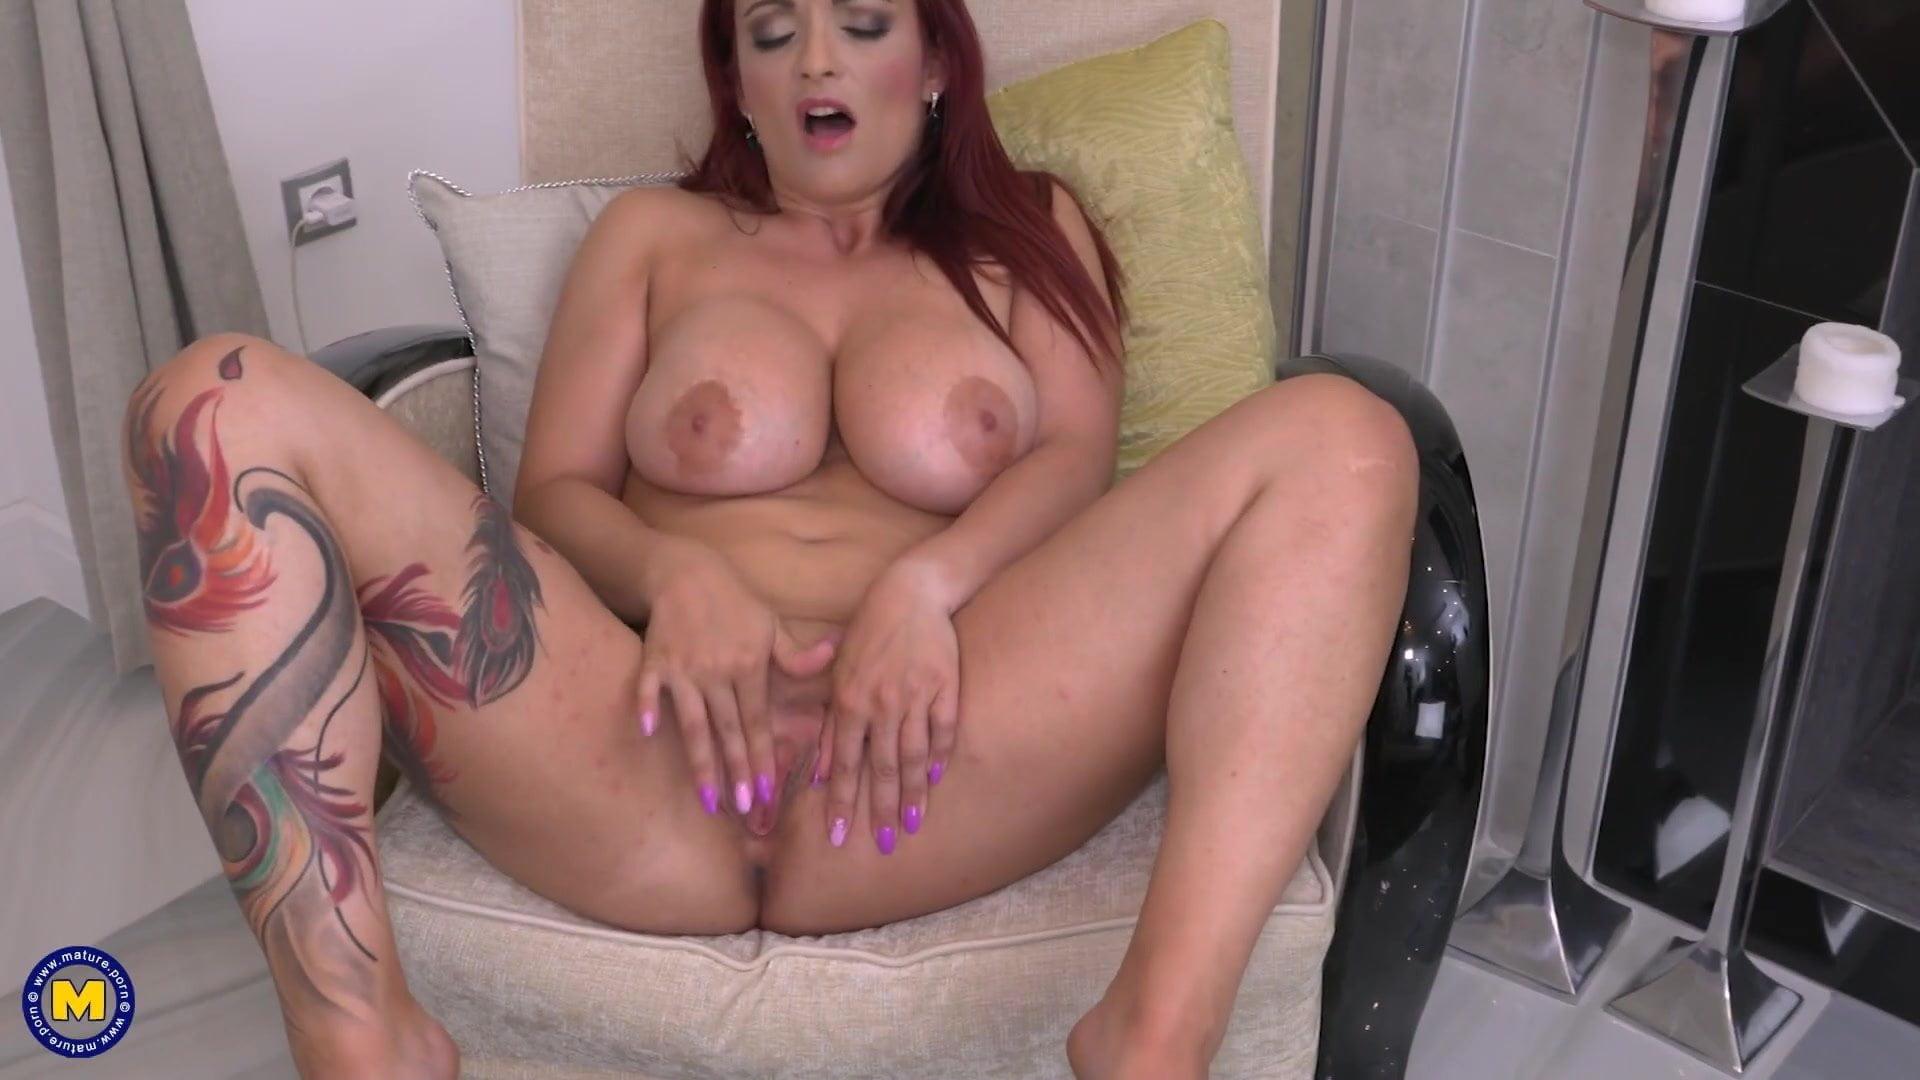 Sara faye interracial porn